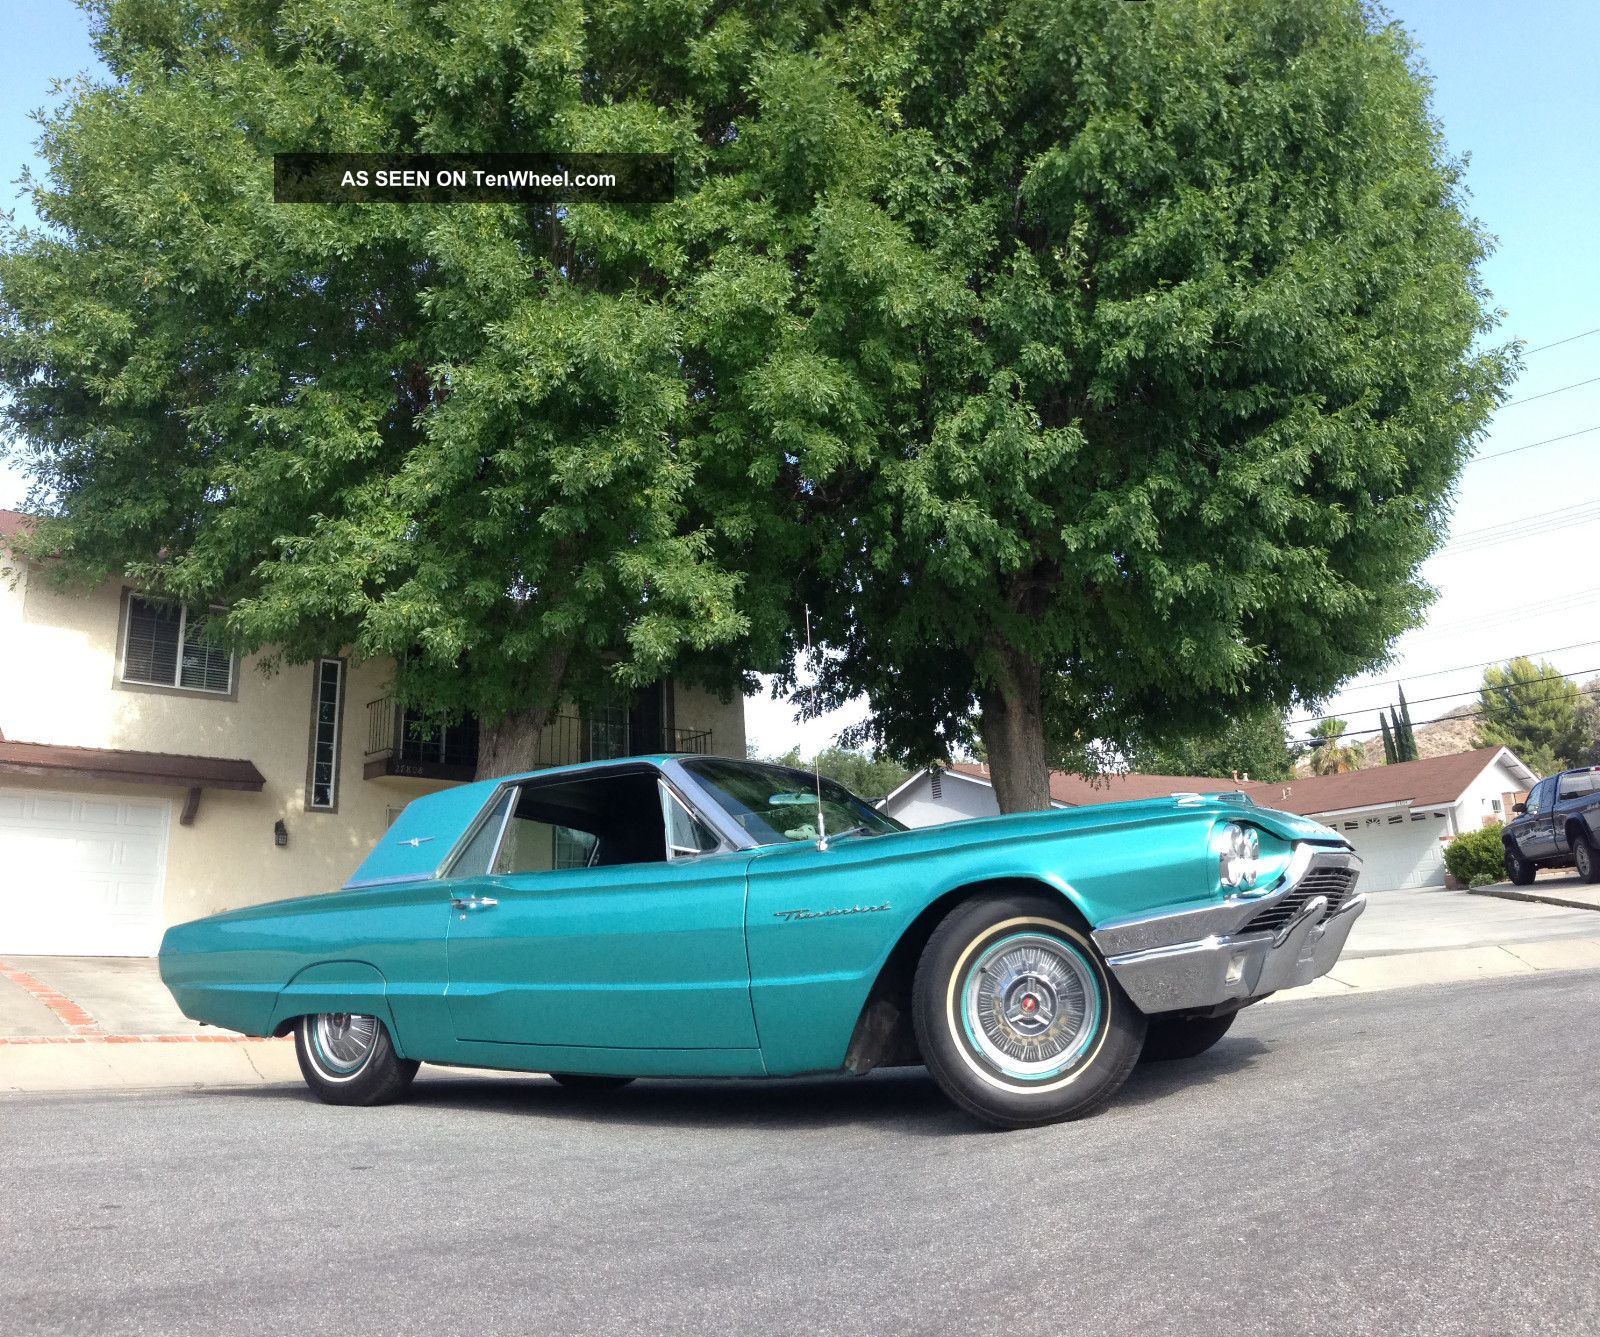 1964 Ford Thunderbird Green Motor 2nd Owner Car Thunderbird photo